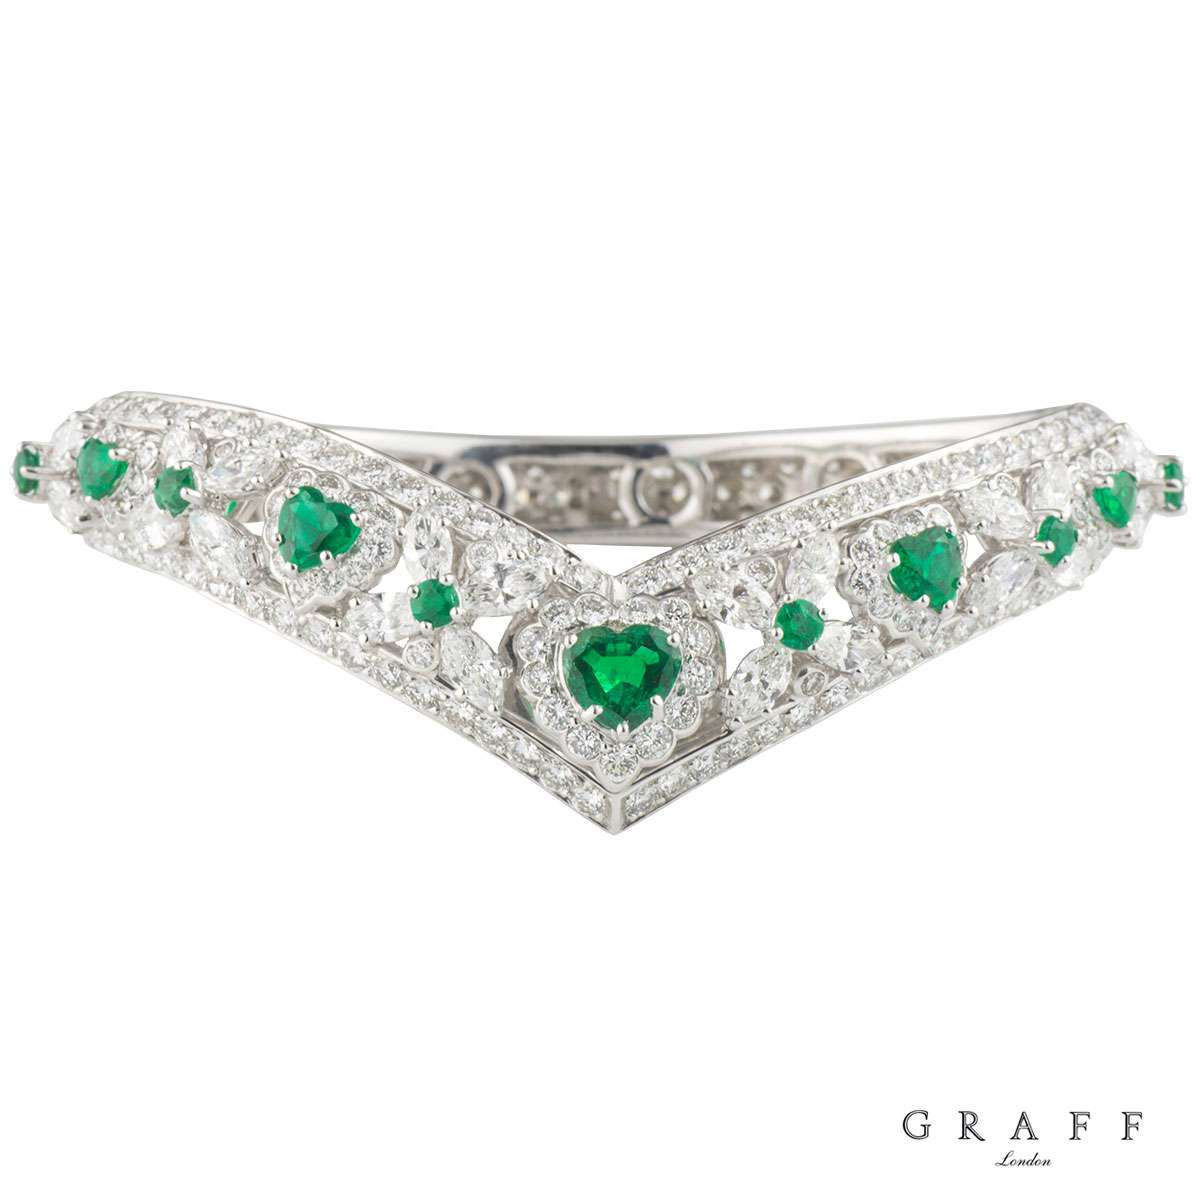 Graff Diamond, Emerald, Ruby & Sapphire Set Bangles - Rich ...